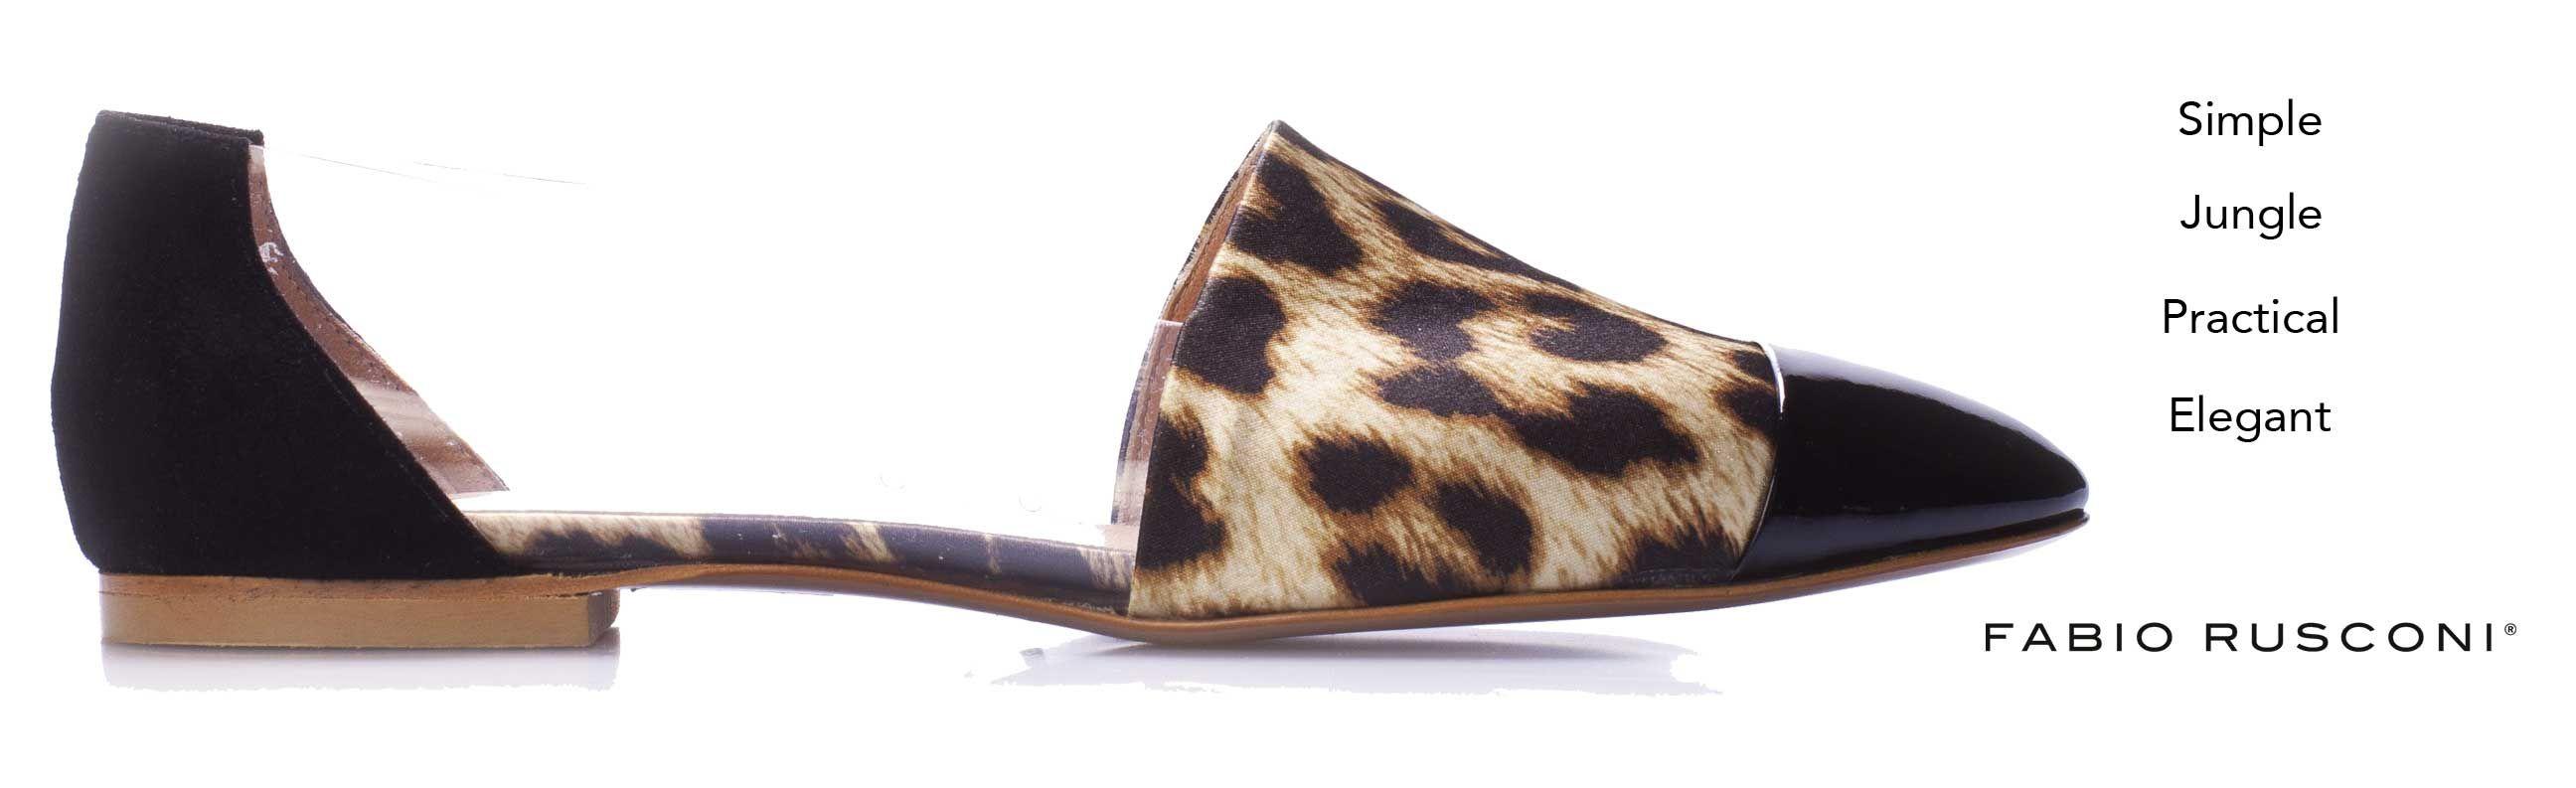 Simple, elegant, jungle, practical: #FabioRusconi Leopard printed satin slipper, with transparent details: http://bit.ly/1lhxaZT #MadeIntaly #Shoes